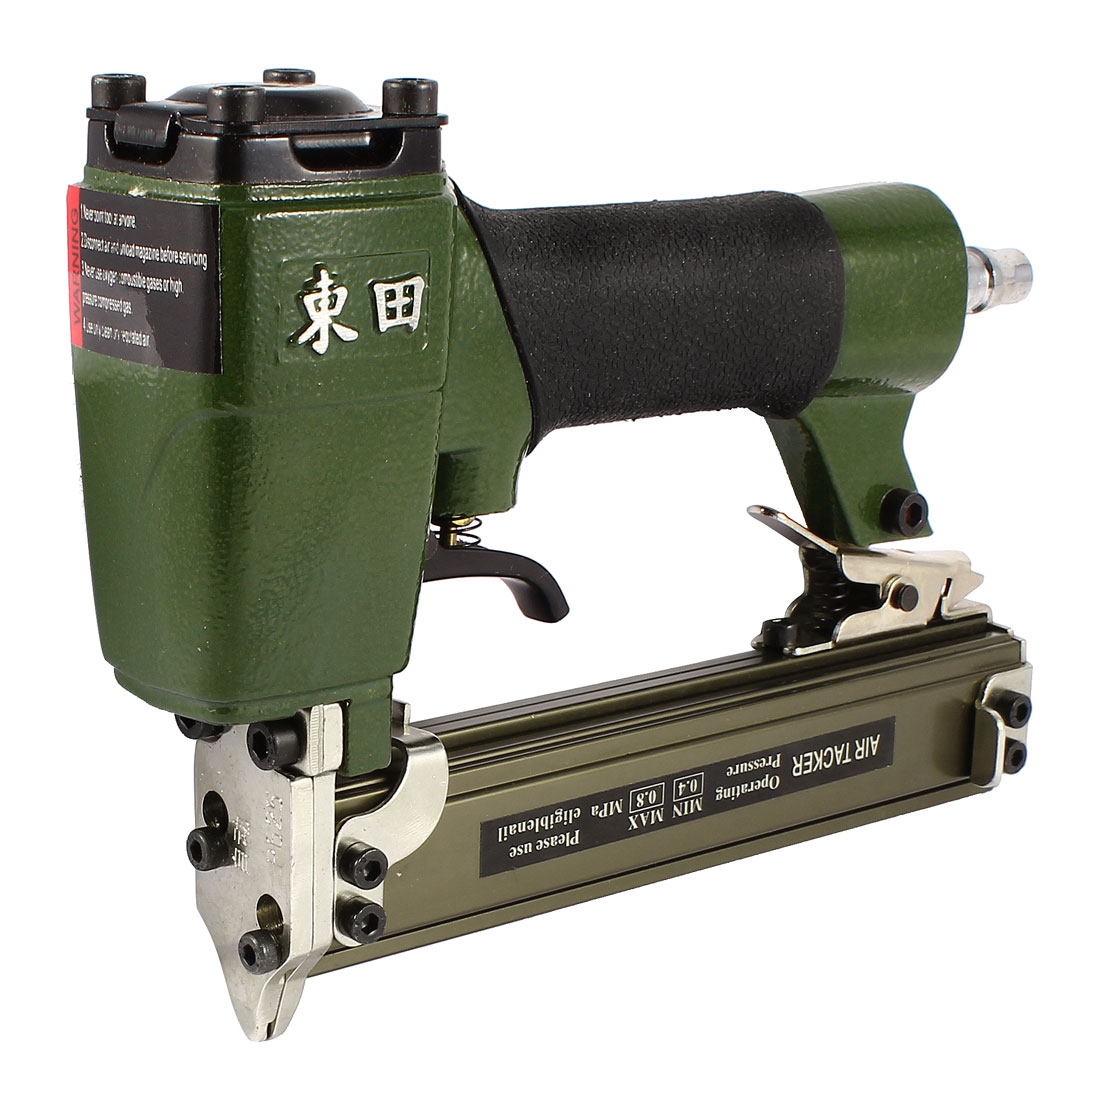 P625 Air Nailer Gun Pneumatic Stapler Power Tools w Piston Driver Kit